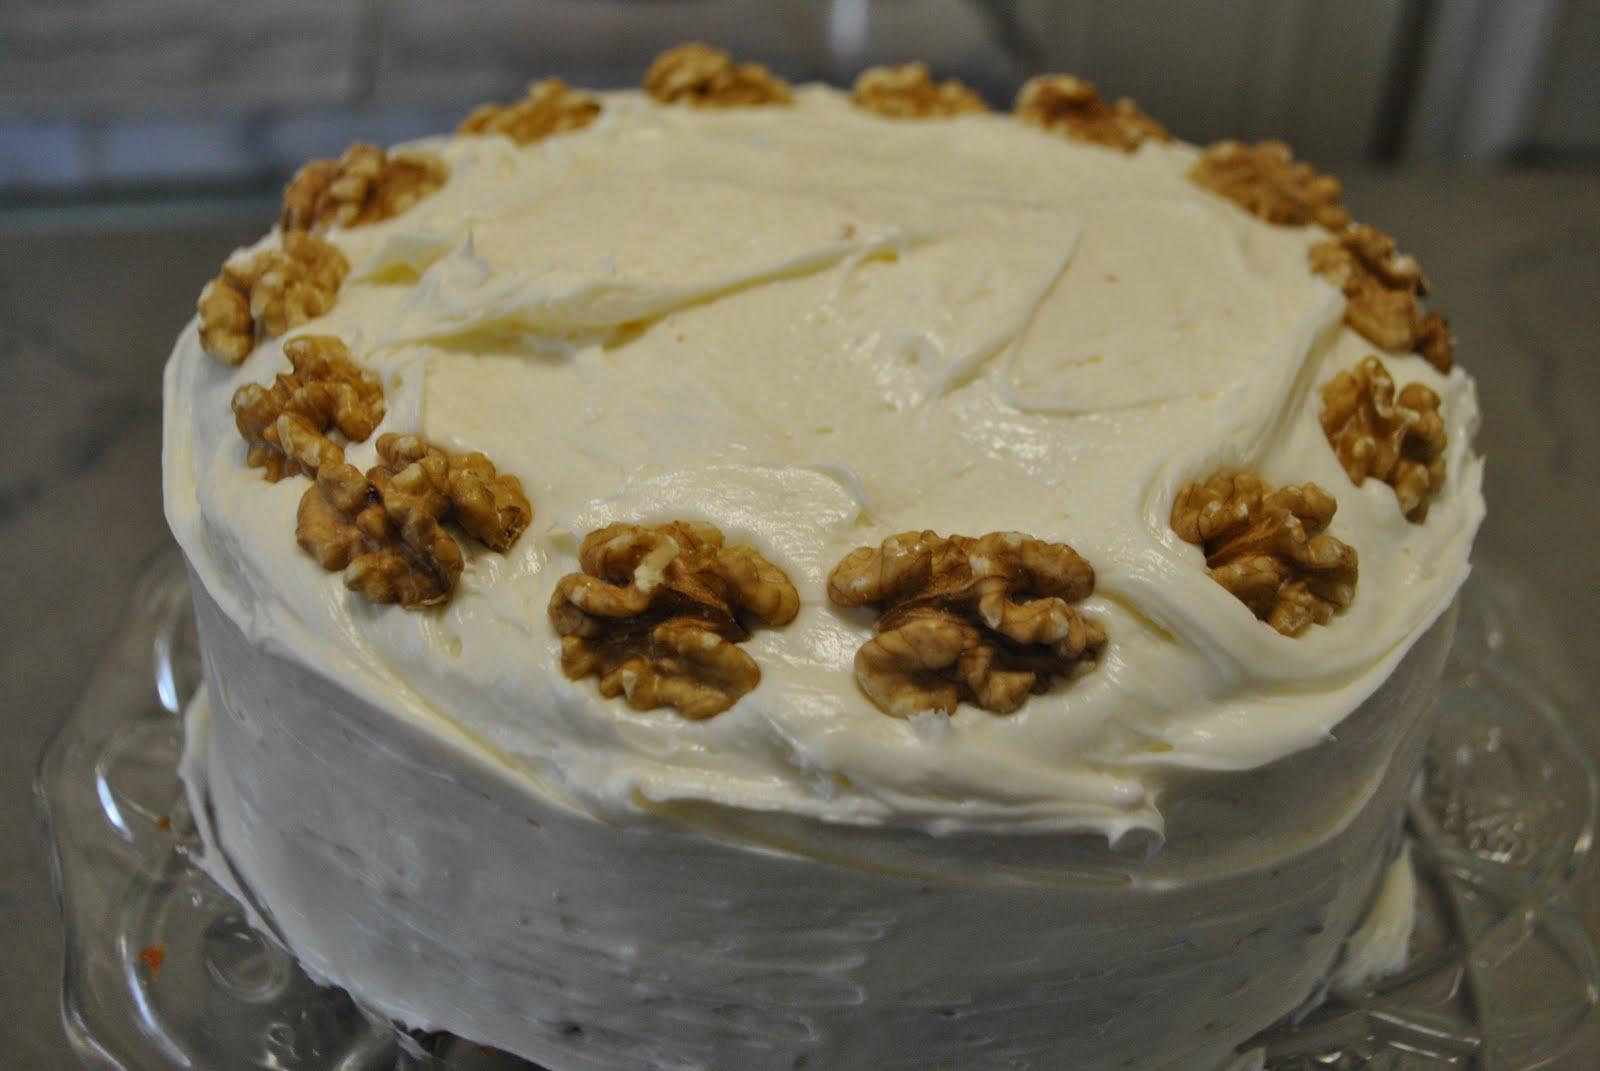 Sheila Lukins Carrot Cake